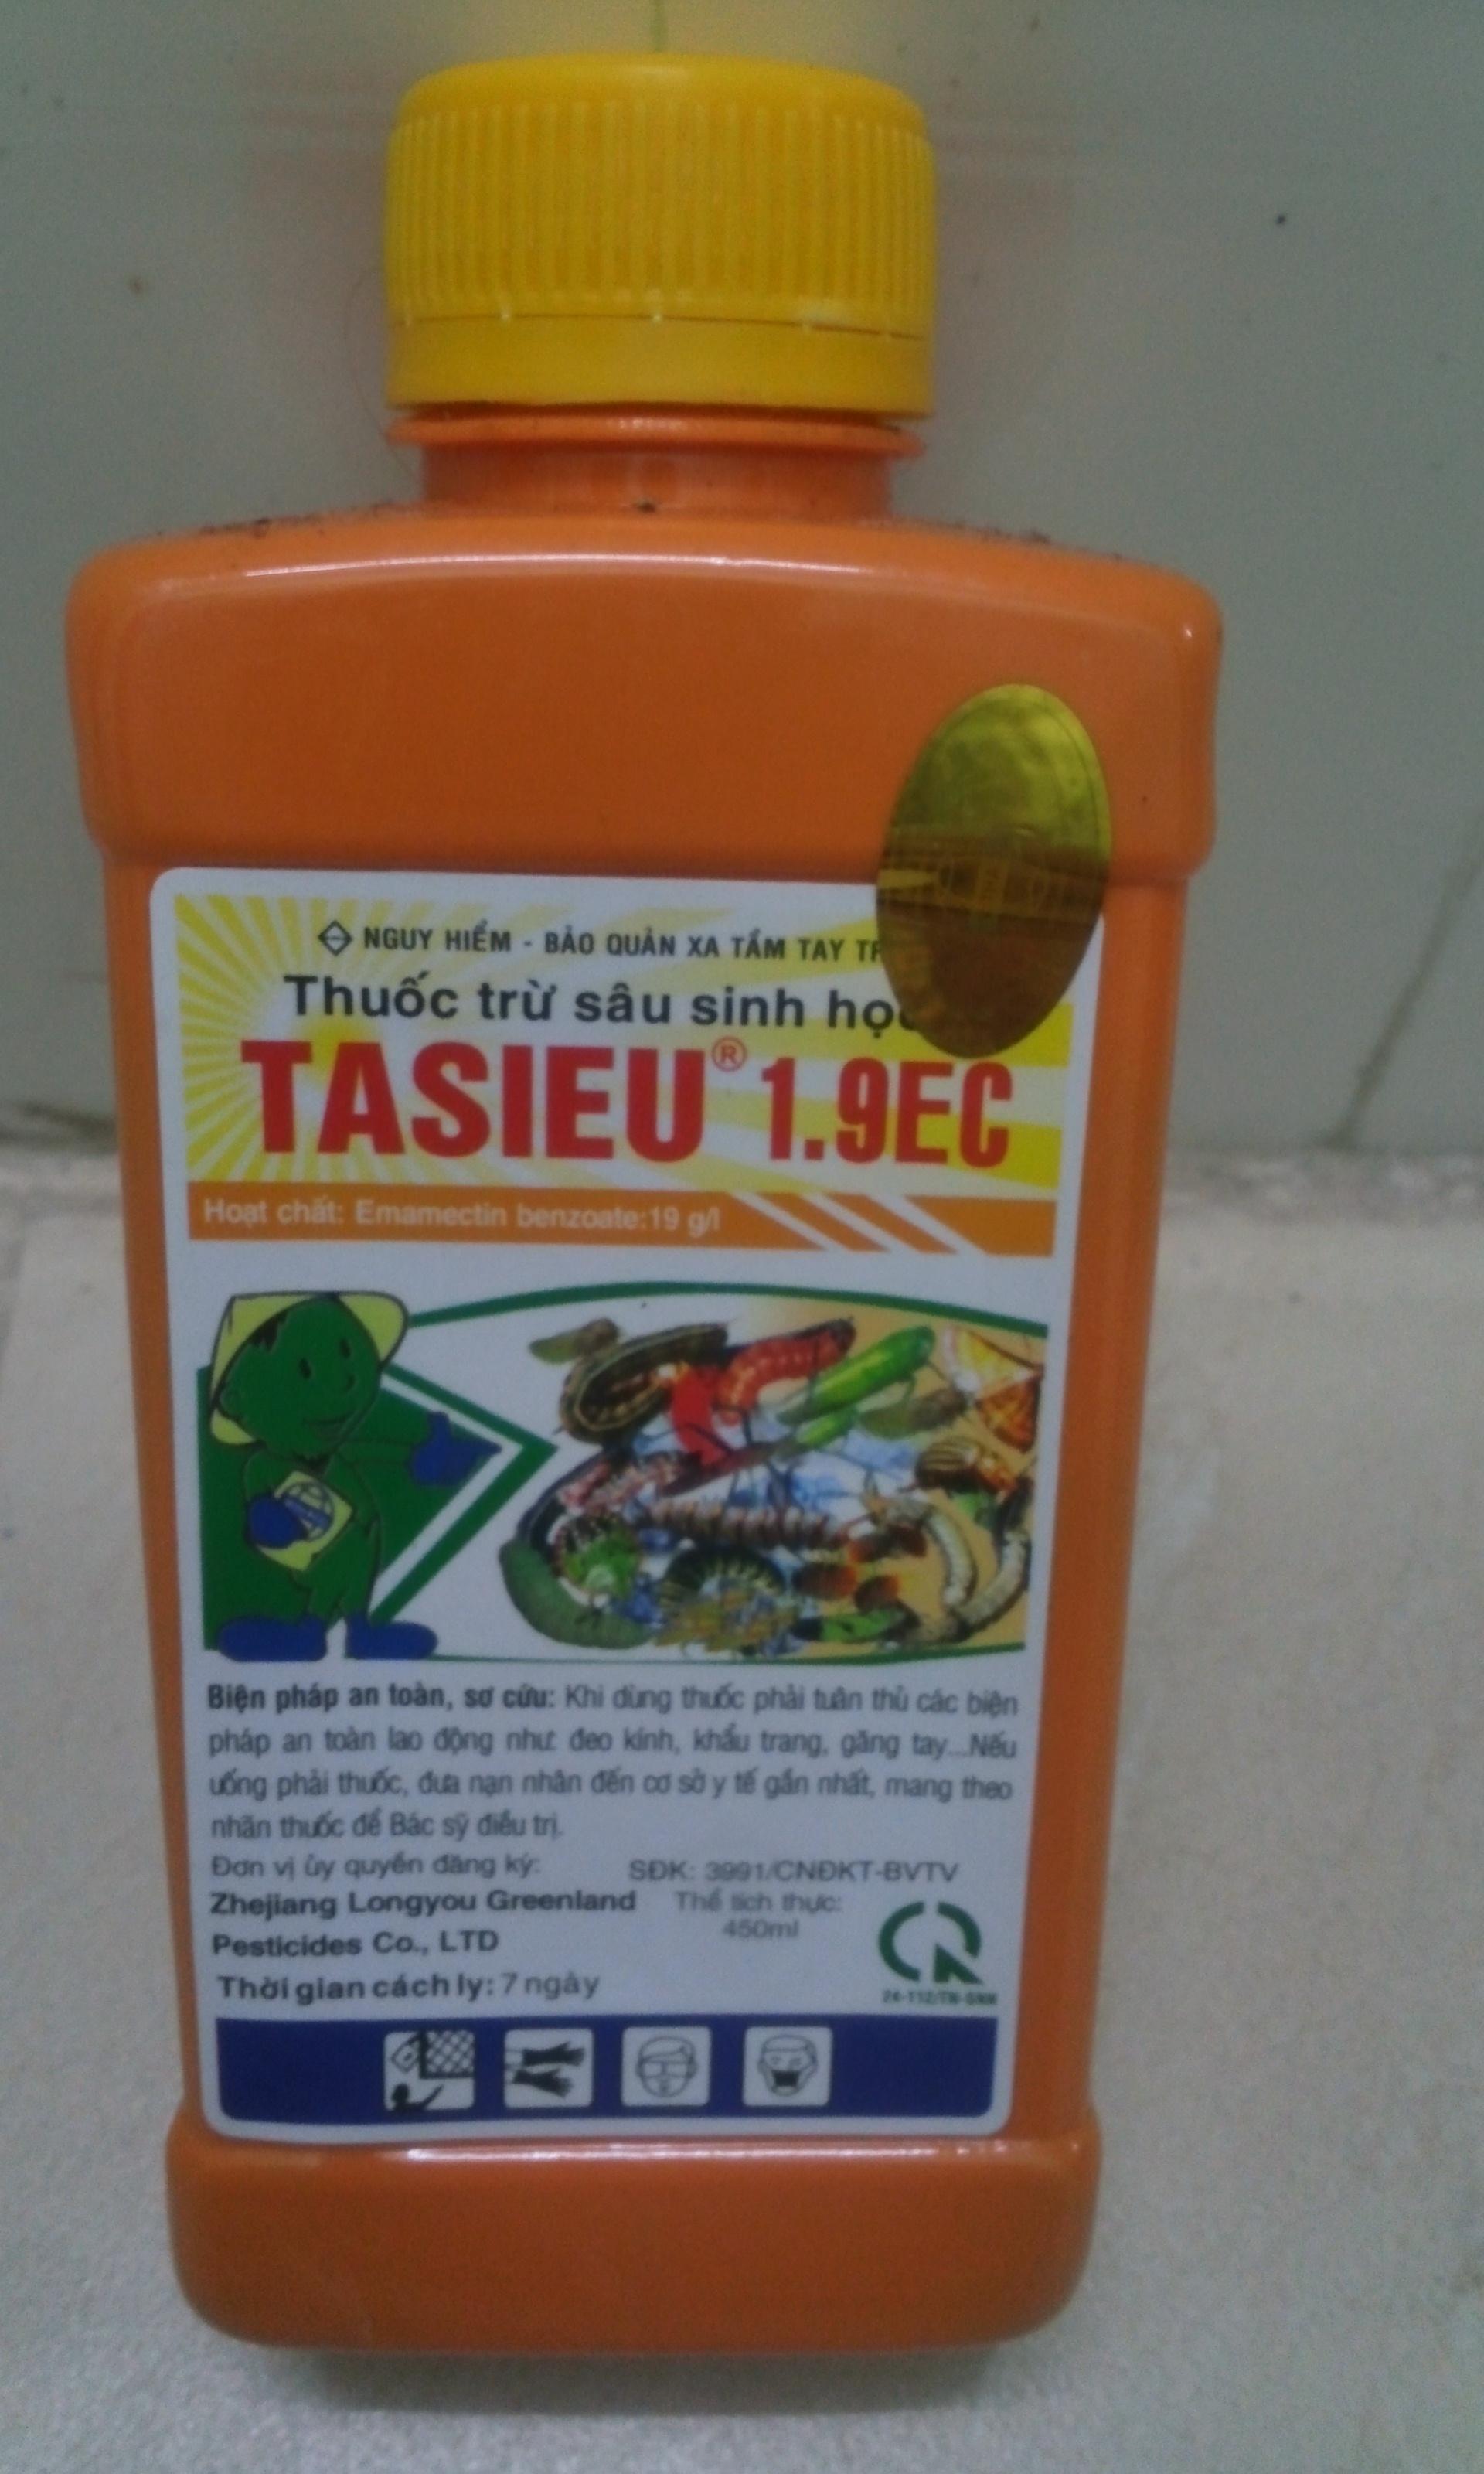 Thuốc trừ sâu sinh học TASIEU 1.9EC 450ml